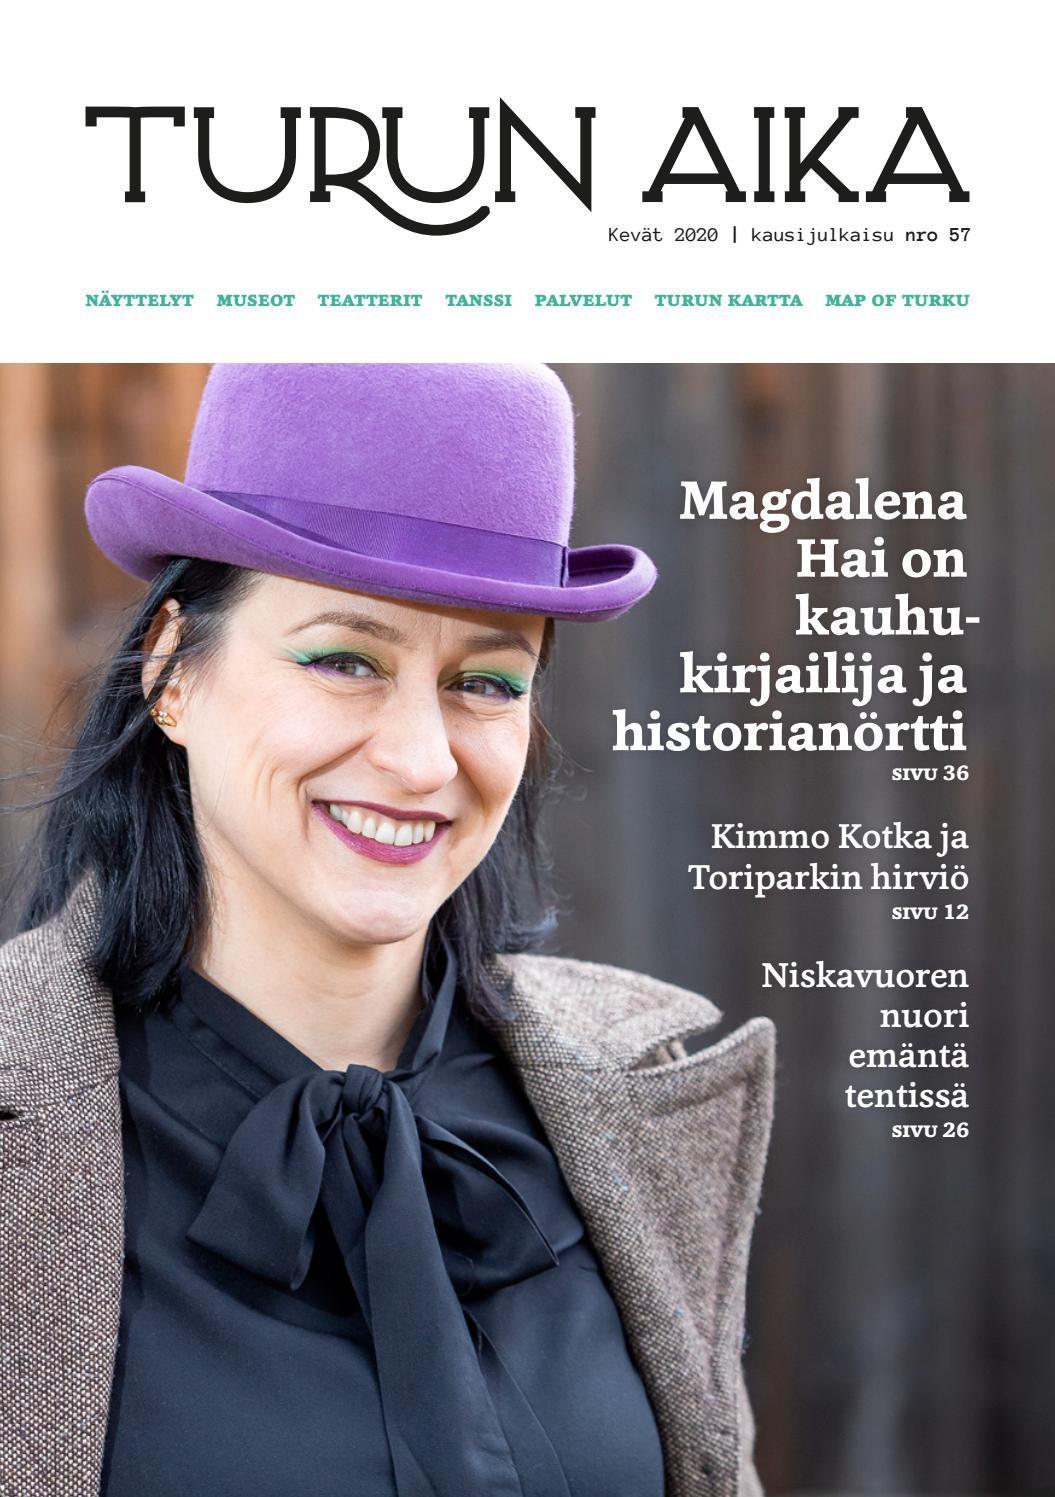 Turun Aika Kevat 2020 By Mobile Kustannus Oy Issuu